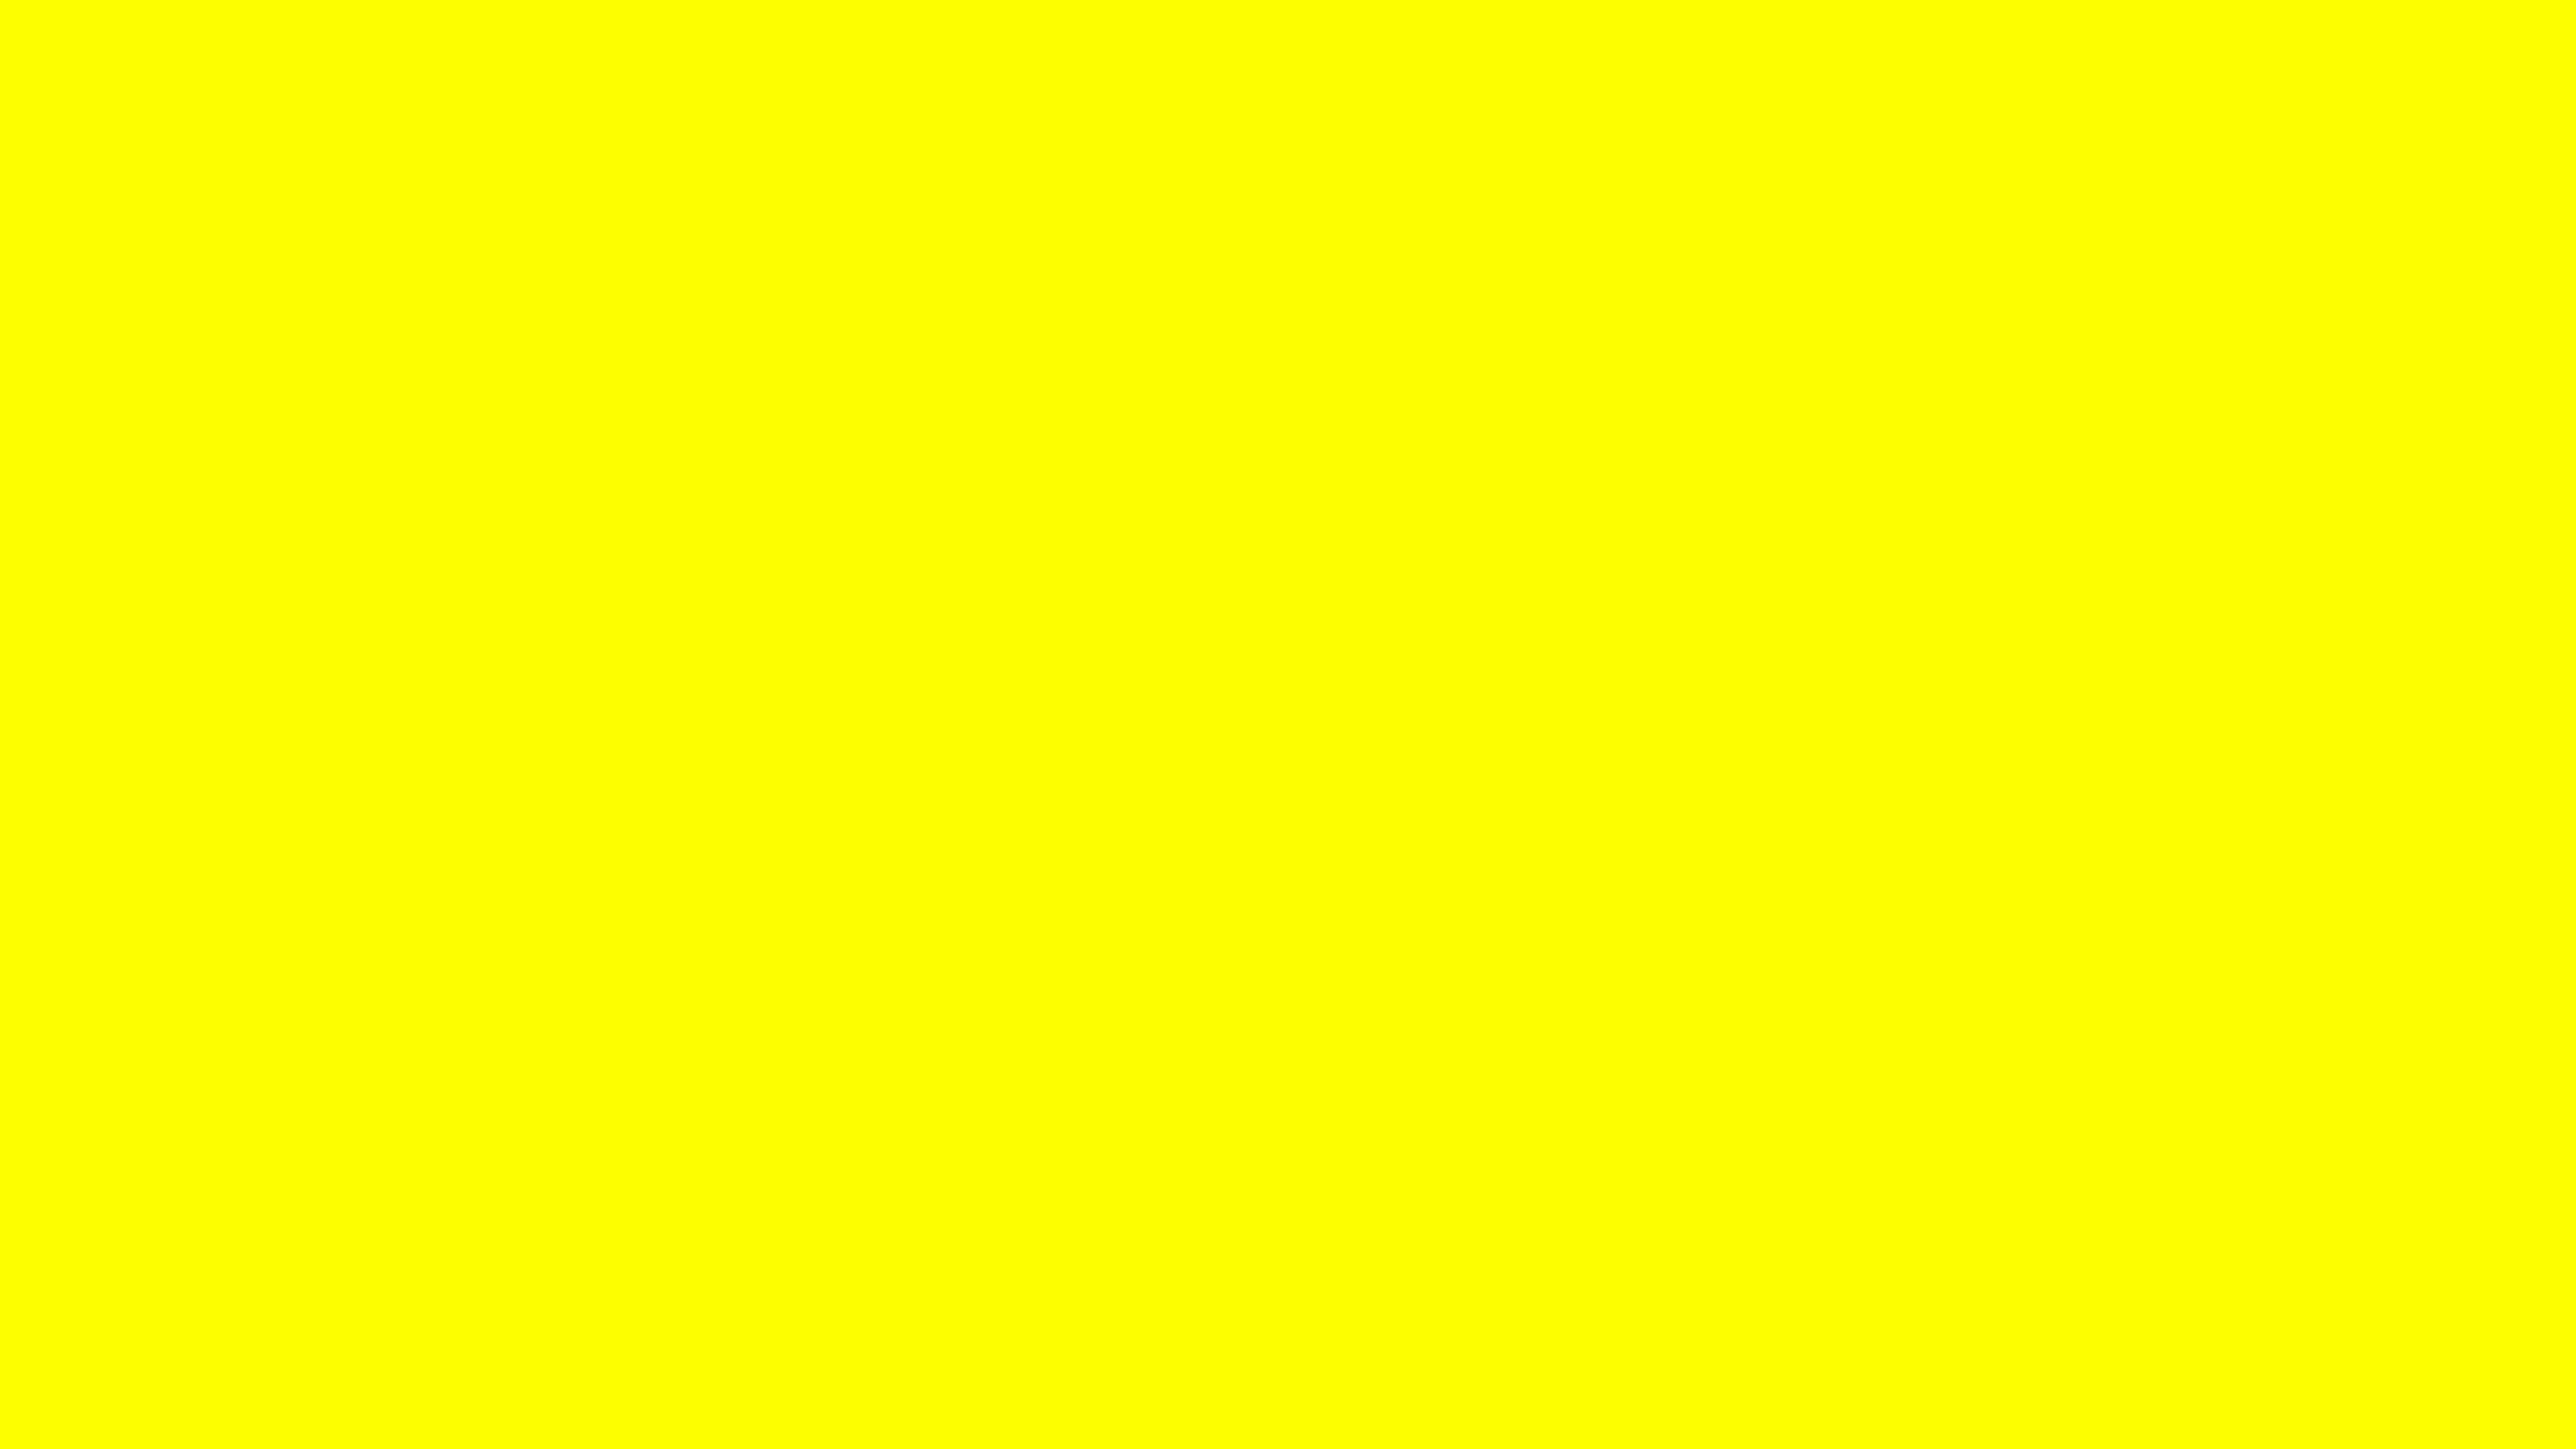 4096x2304 Lemon Glacier Solid Color Background